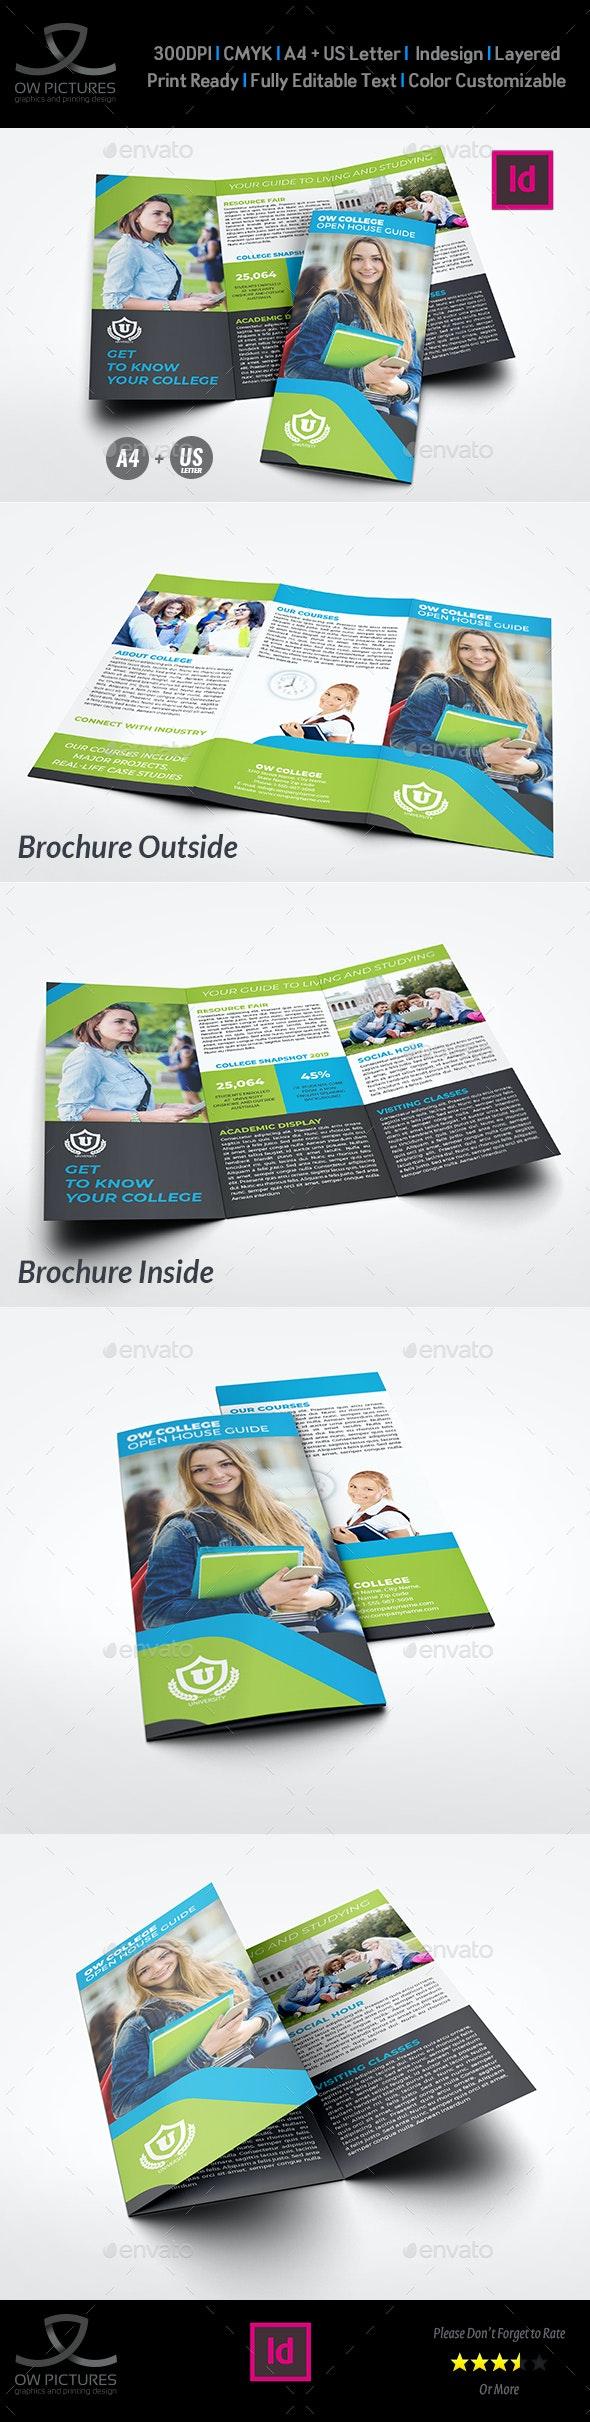 College Open House Tri-Fold Brochure Template - Brochures Print Templates